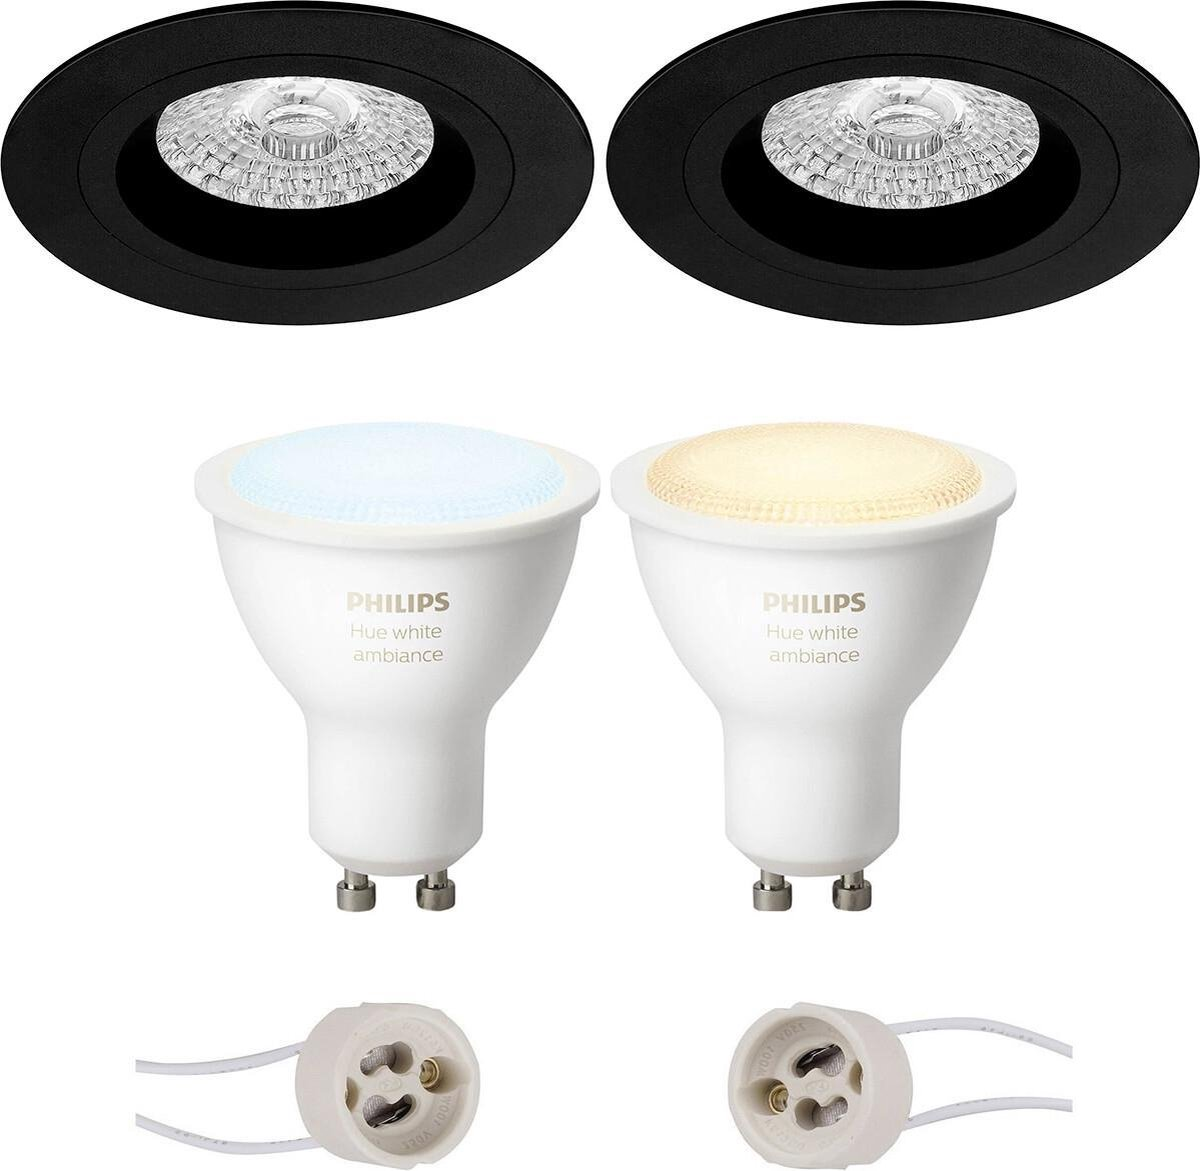 PHILIPS HUE - LED Spot Set GU10 - White Ambiance - Bluetooth - Proma Rodos Pro - Inbouw Rond - Mat Zwart - Ø93mm